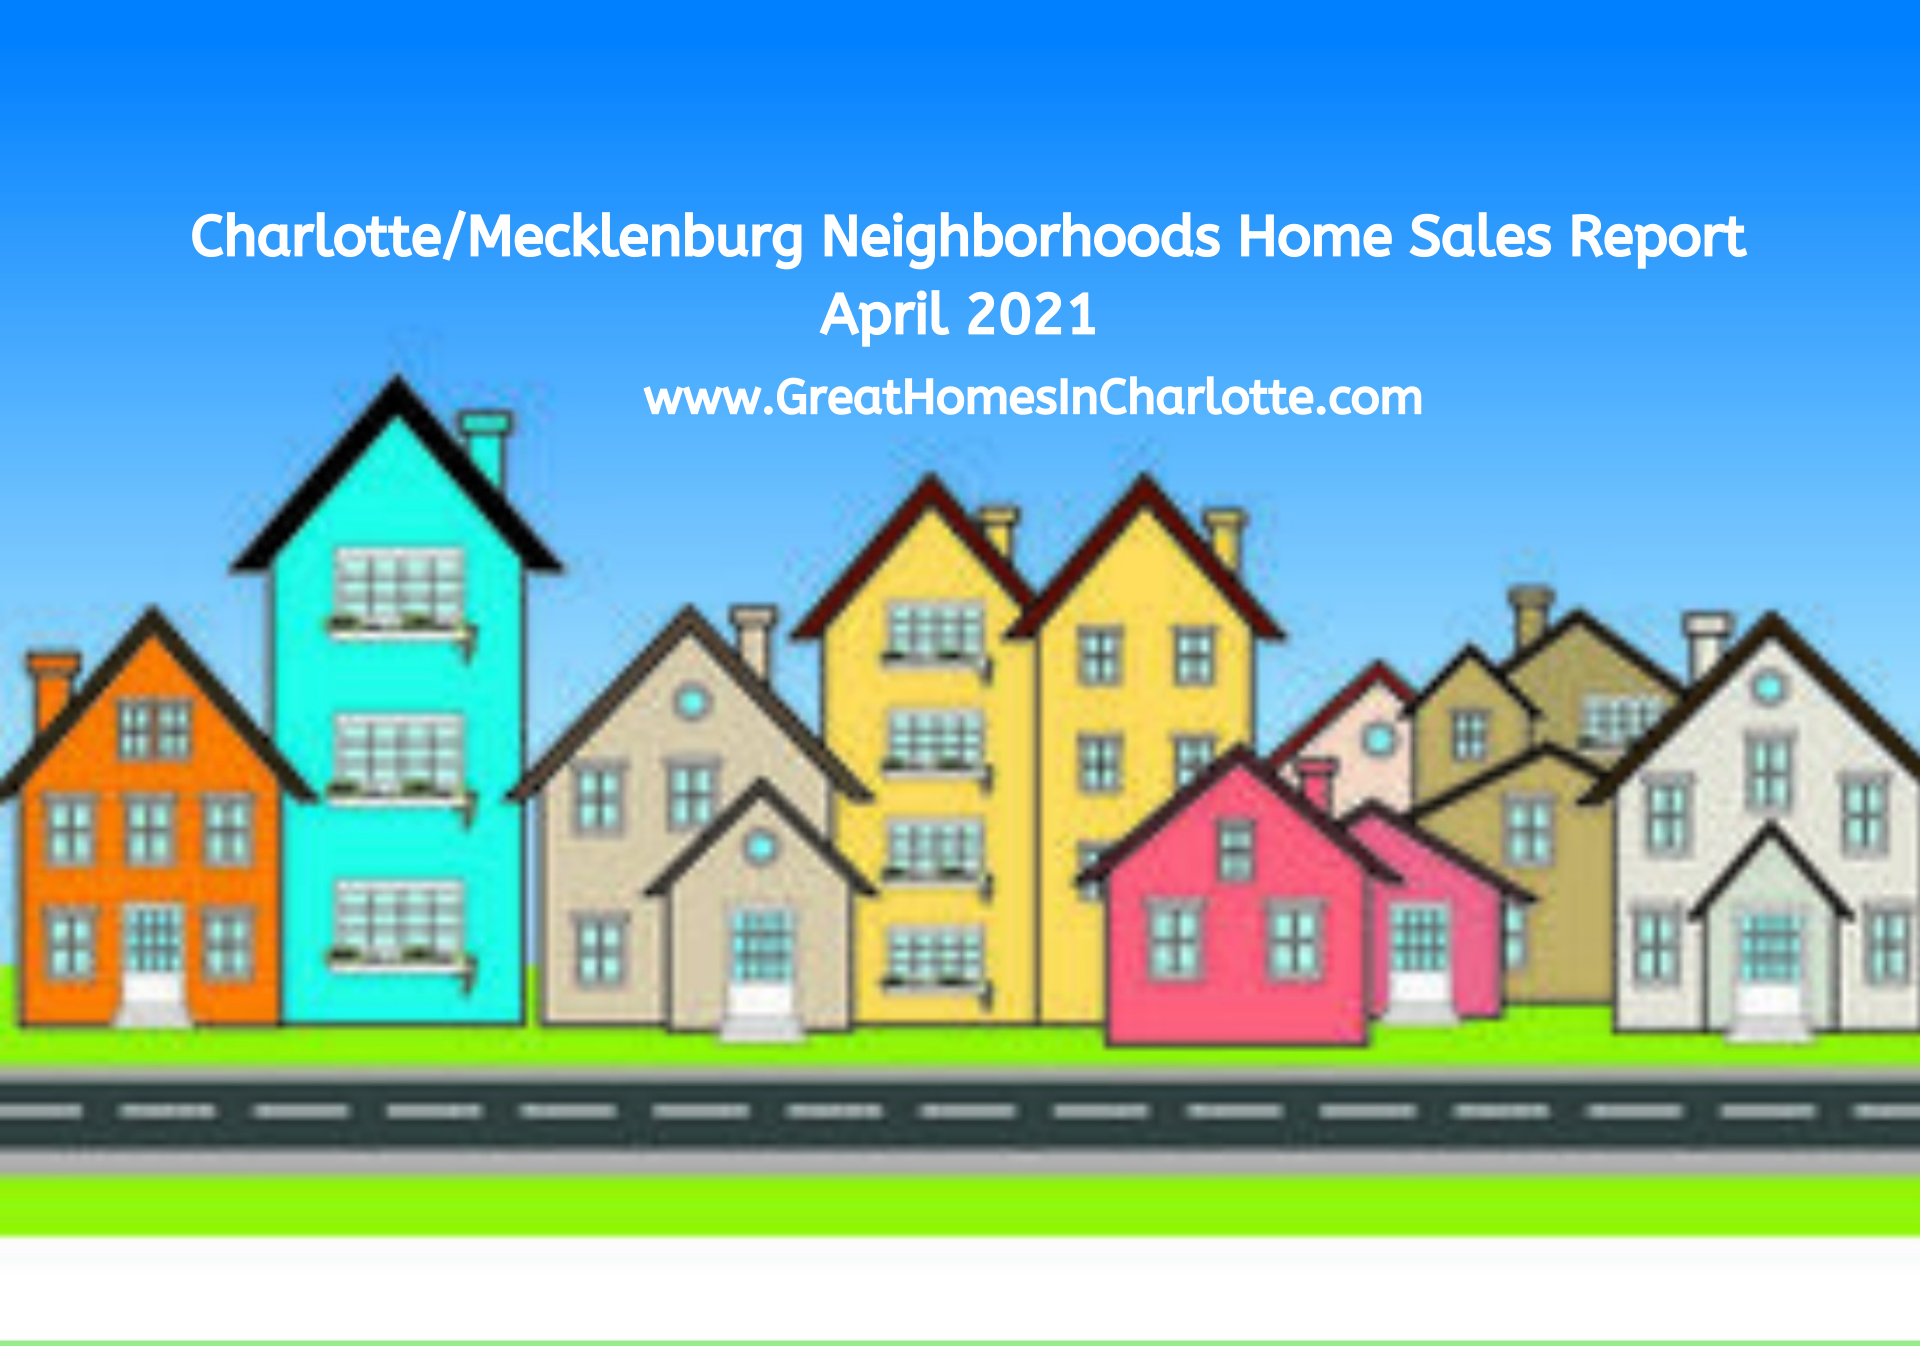 250 Top Selling Neighborhoods In Charlotte/Mecklenburg: April 2021